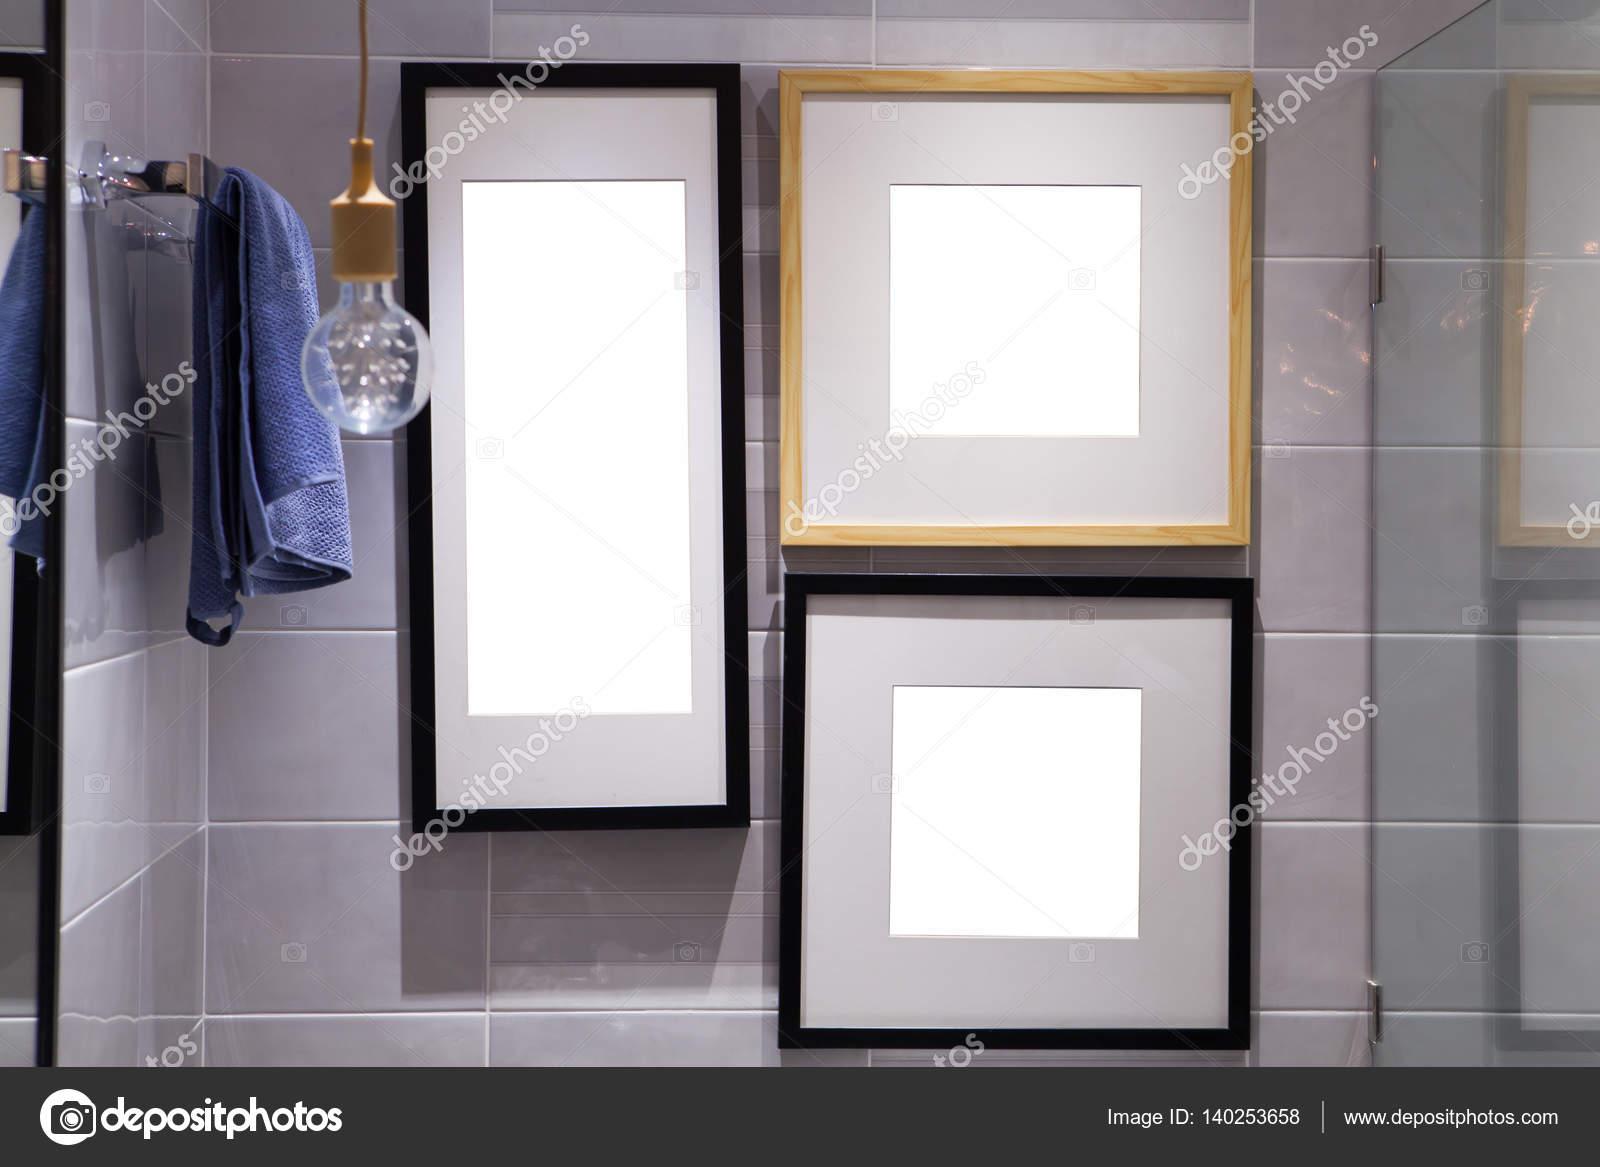 Holz Bilderrahmen An Plank Wand Im Badezimmer Stockfoto C Ekachai